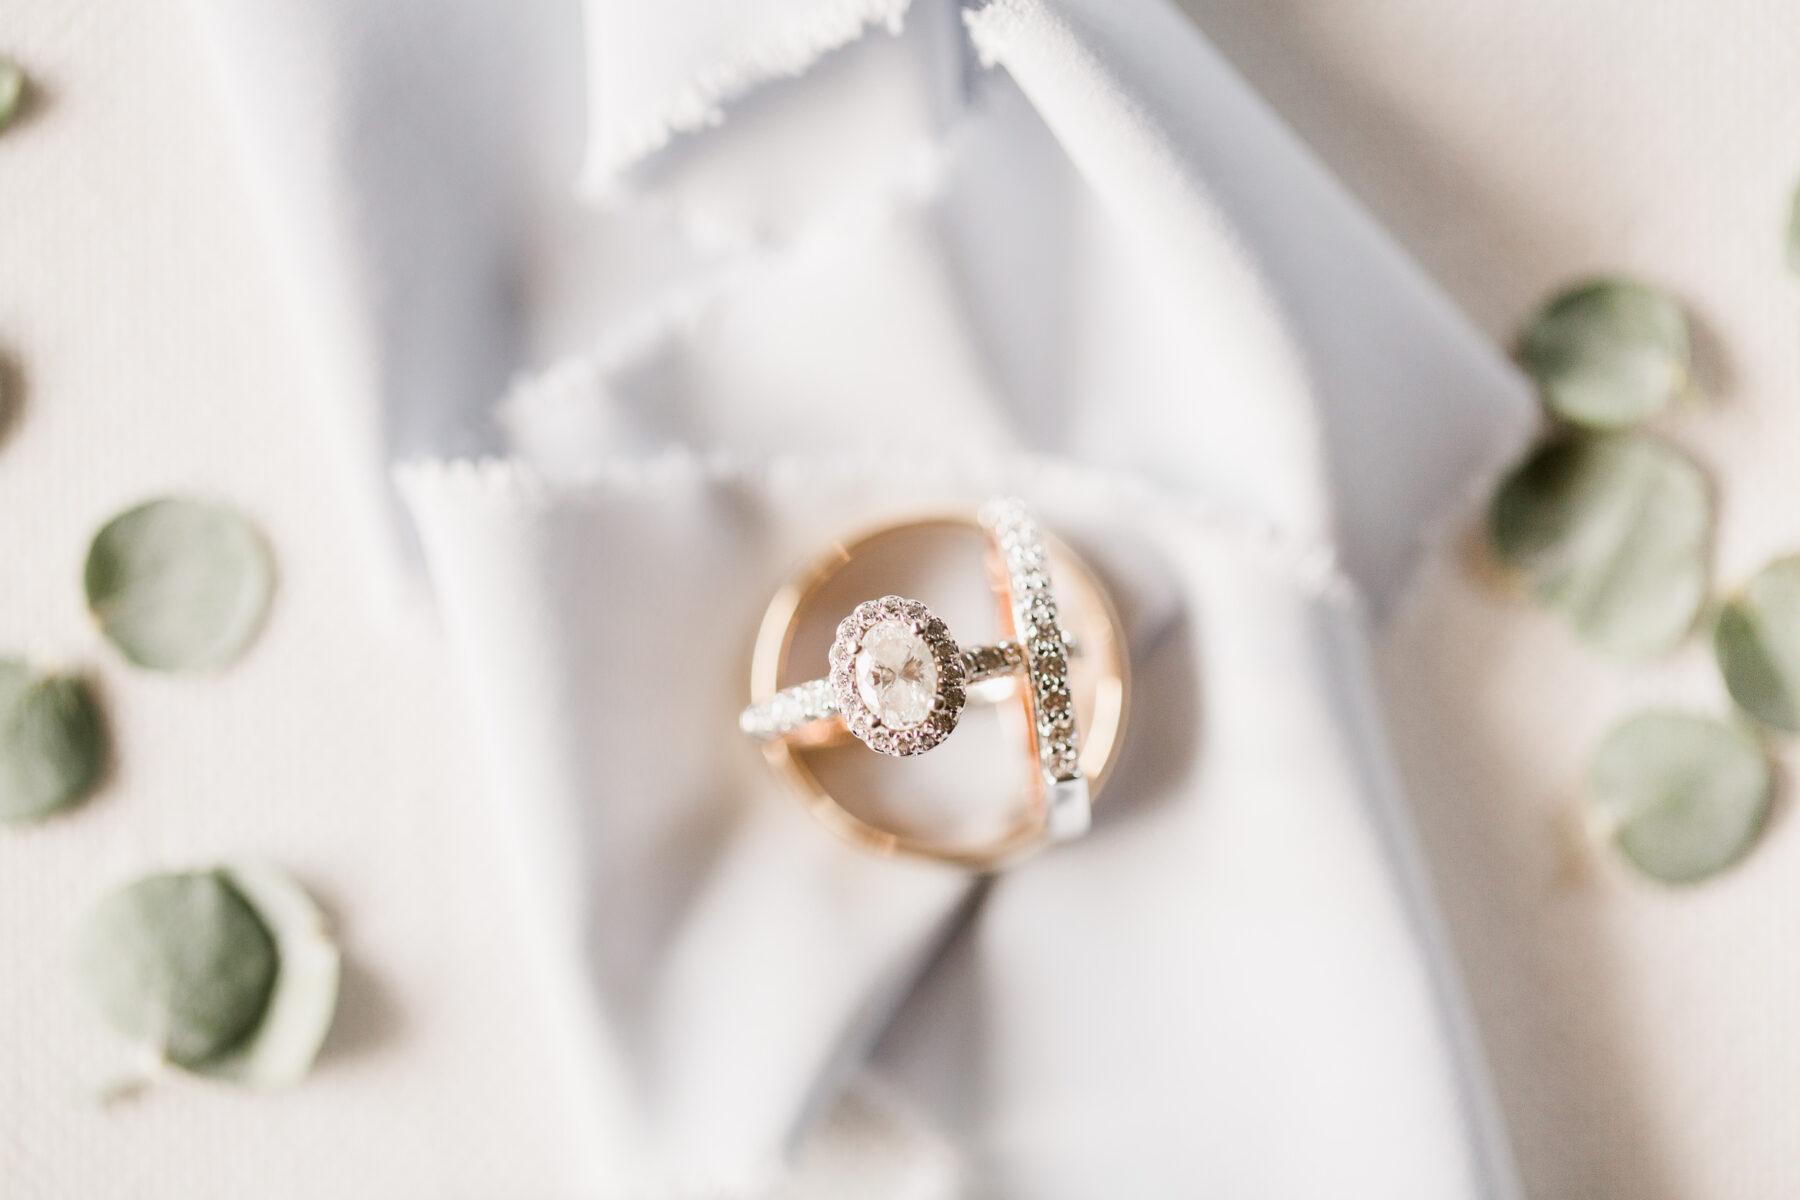 Oval Halo Engagement Ring and Wedding Bands   Nashville Bride Guide